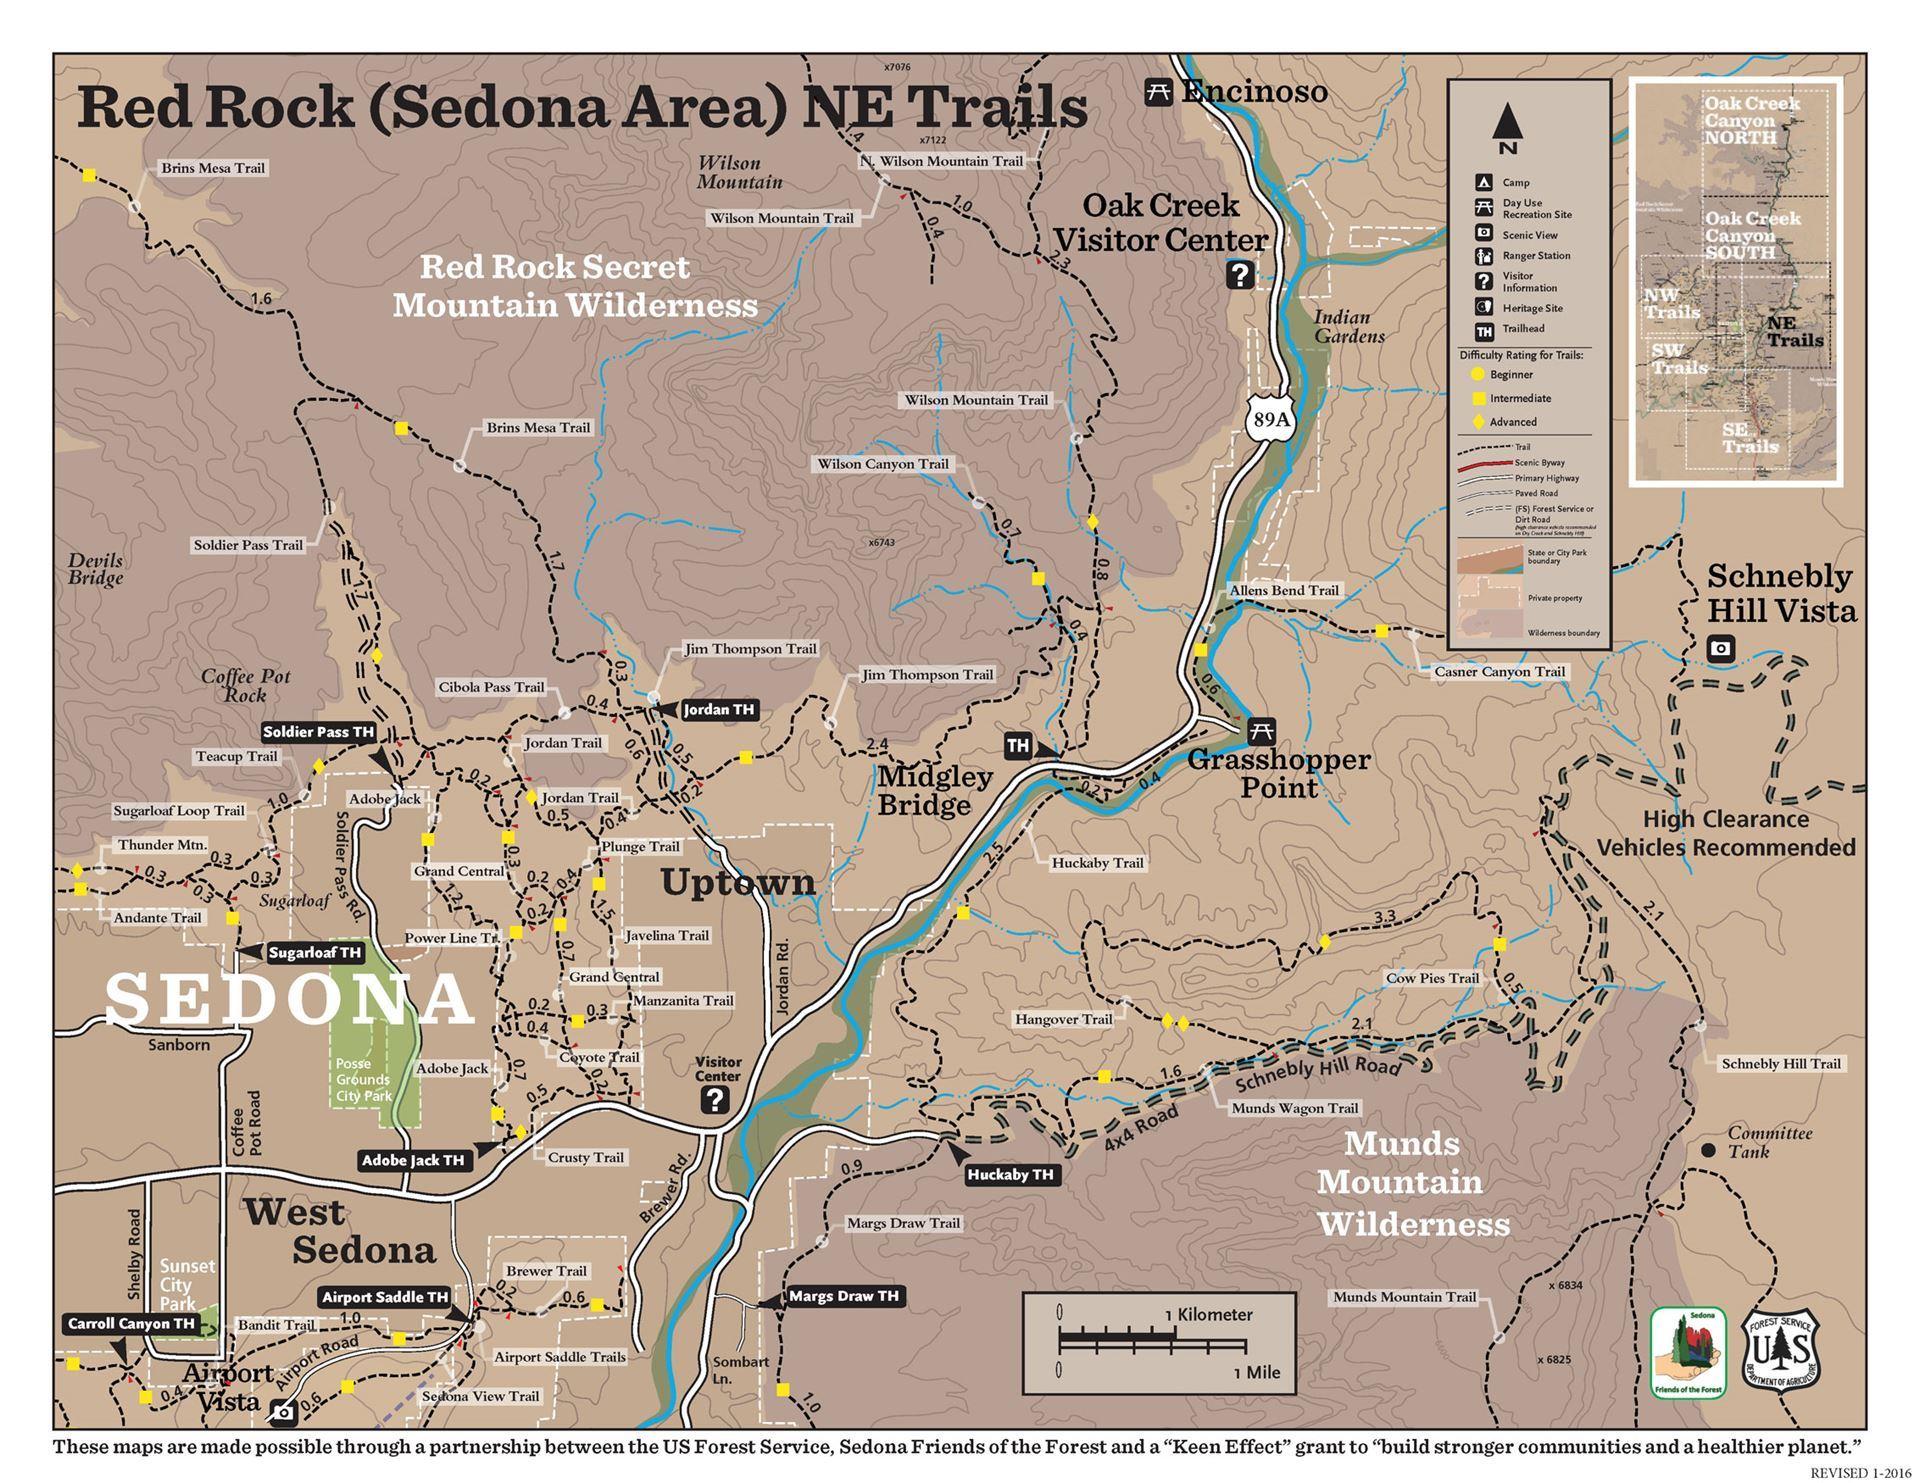 Sedona Red Rock Trail Fund - Maps on asheville hikes map, ole az bradshaw ranch location map, arches national park hikes map, red rock hikes map, utah hikes map, sedona arizona forest road maps, salt lake city hikes map, phoenix hikes map, portland hikes map, sabino canyon hiking trails map, sun valley hikes map, bellingham hikes map, moab hikes map, coconino national forest map, flagstaff hikes map, sedona red rock canyon, arizona hiking map, grand canyon hikes map, washington hikes map, bradshaw mountain ranch map,